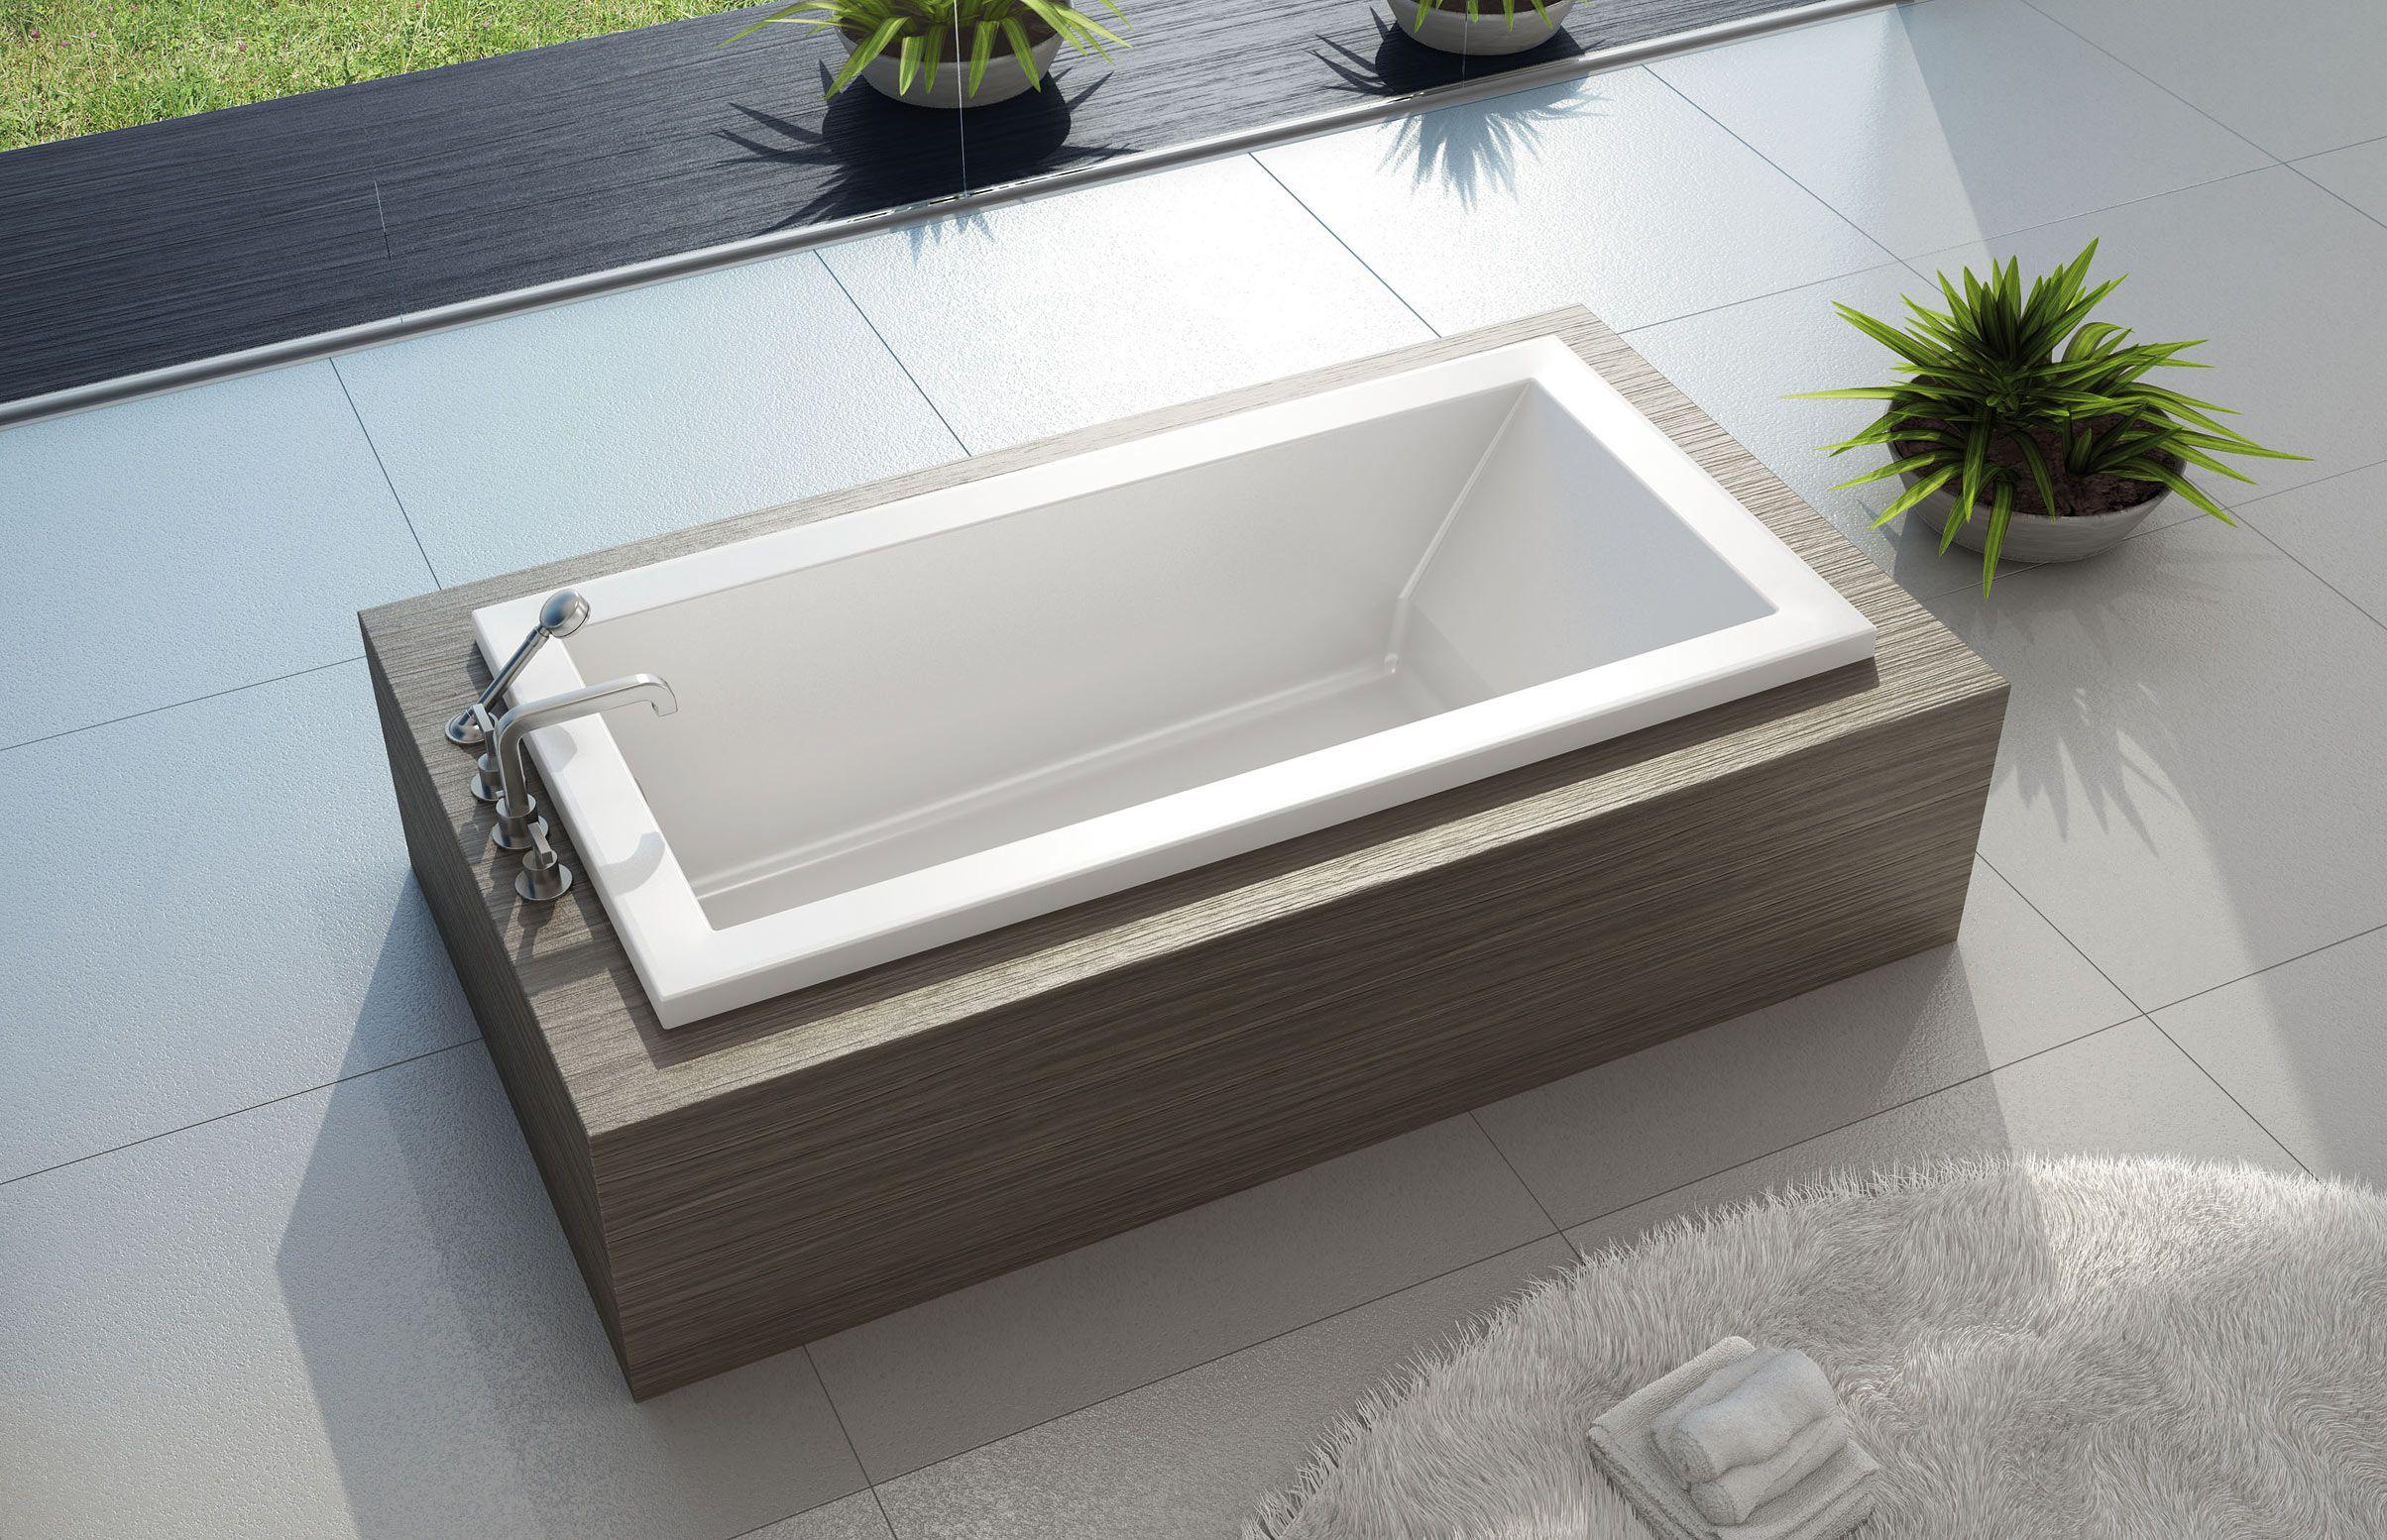 KAVA Drop-in bathtub - MAAX Collection | Dream Home | Pinterest ...